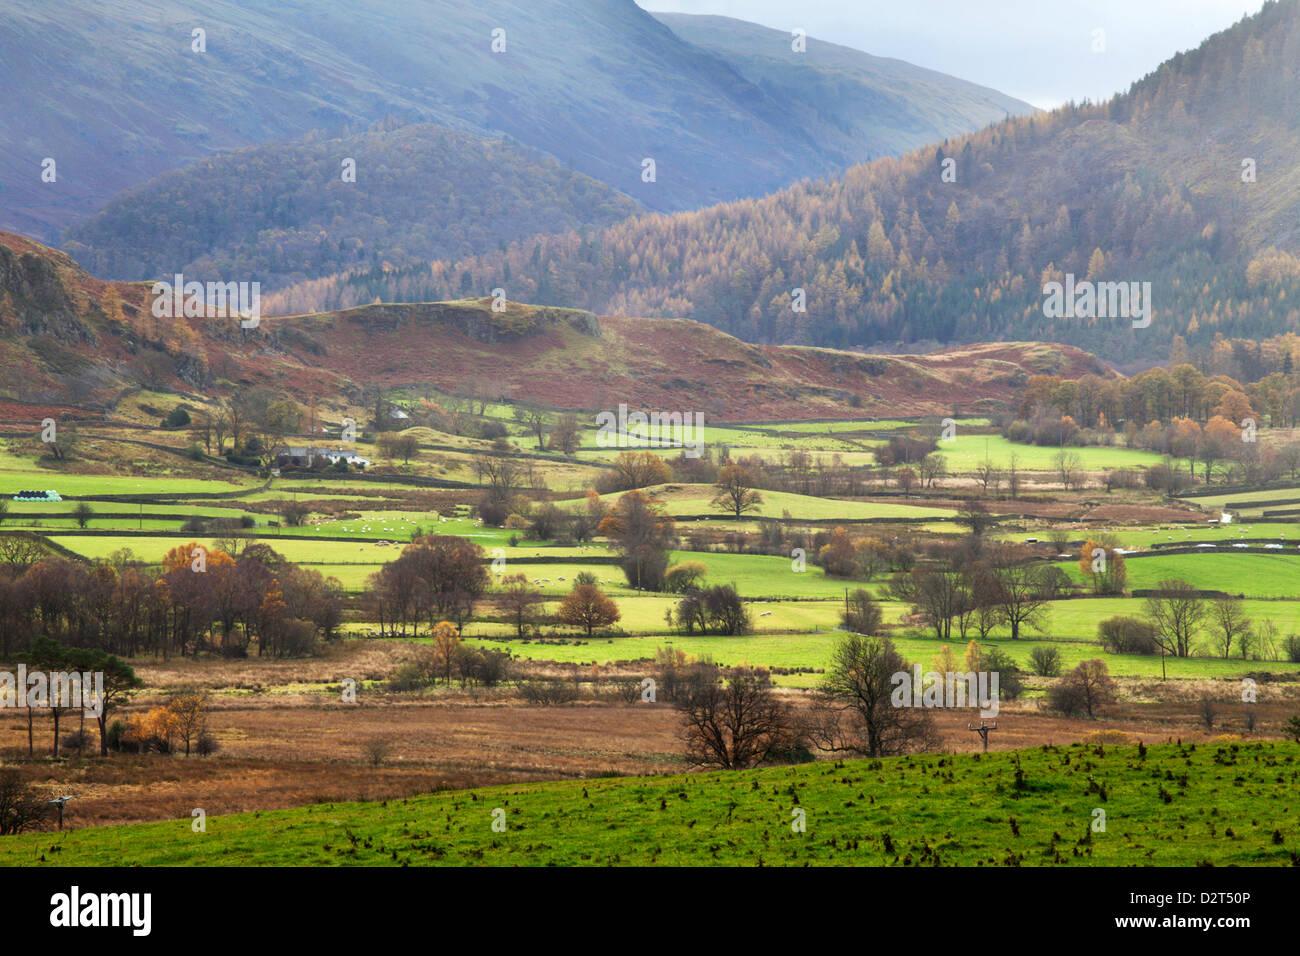 Dale Bottom from Castlerigg Stone Circle, Keswick, Lake District National Park, Cumbria, England, United Kingdom, - Stock Image